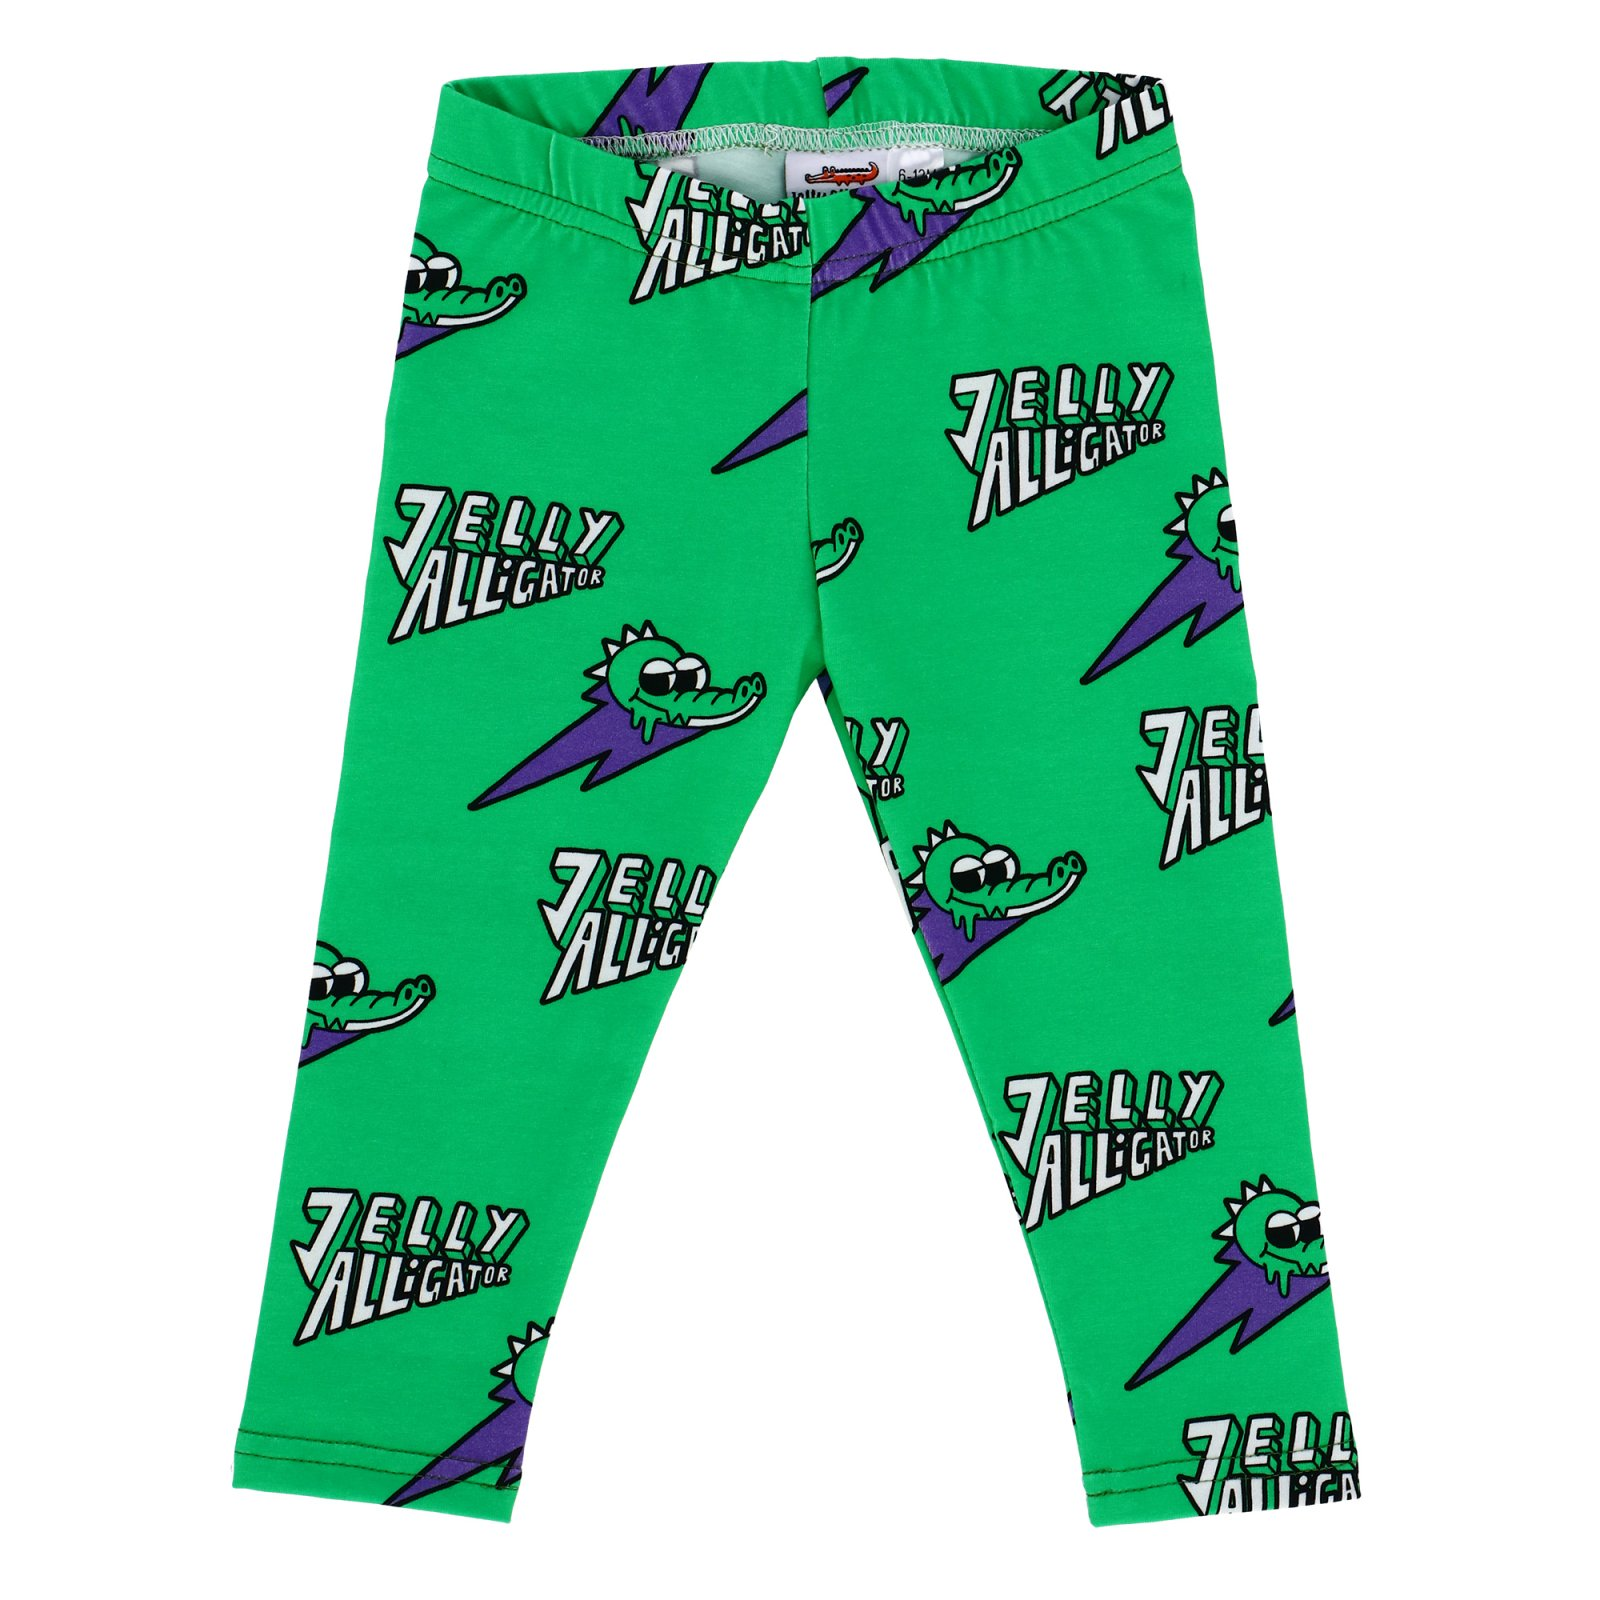 Jelly Alligator Leggings - Green by Jelly Alligator